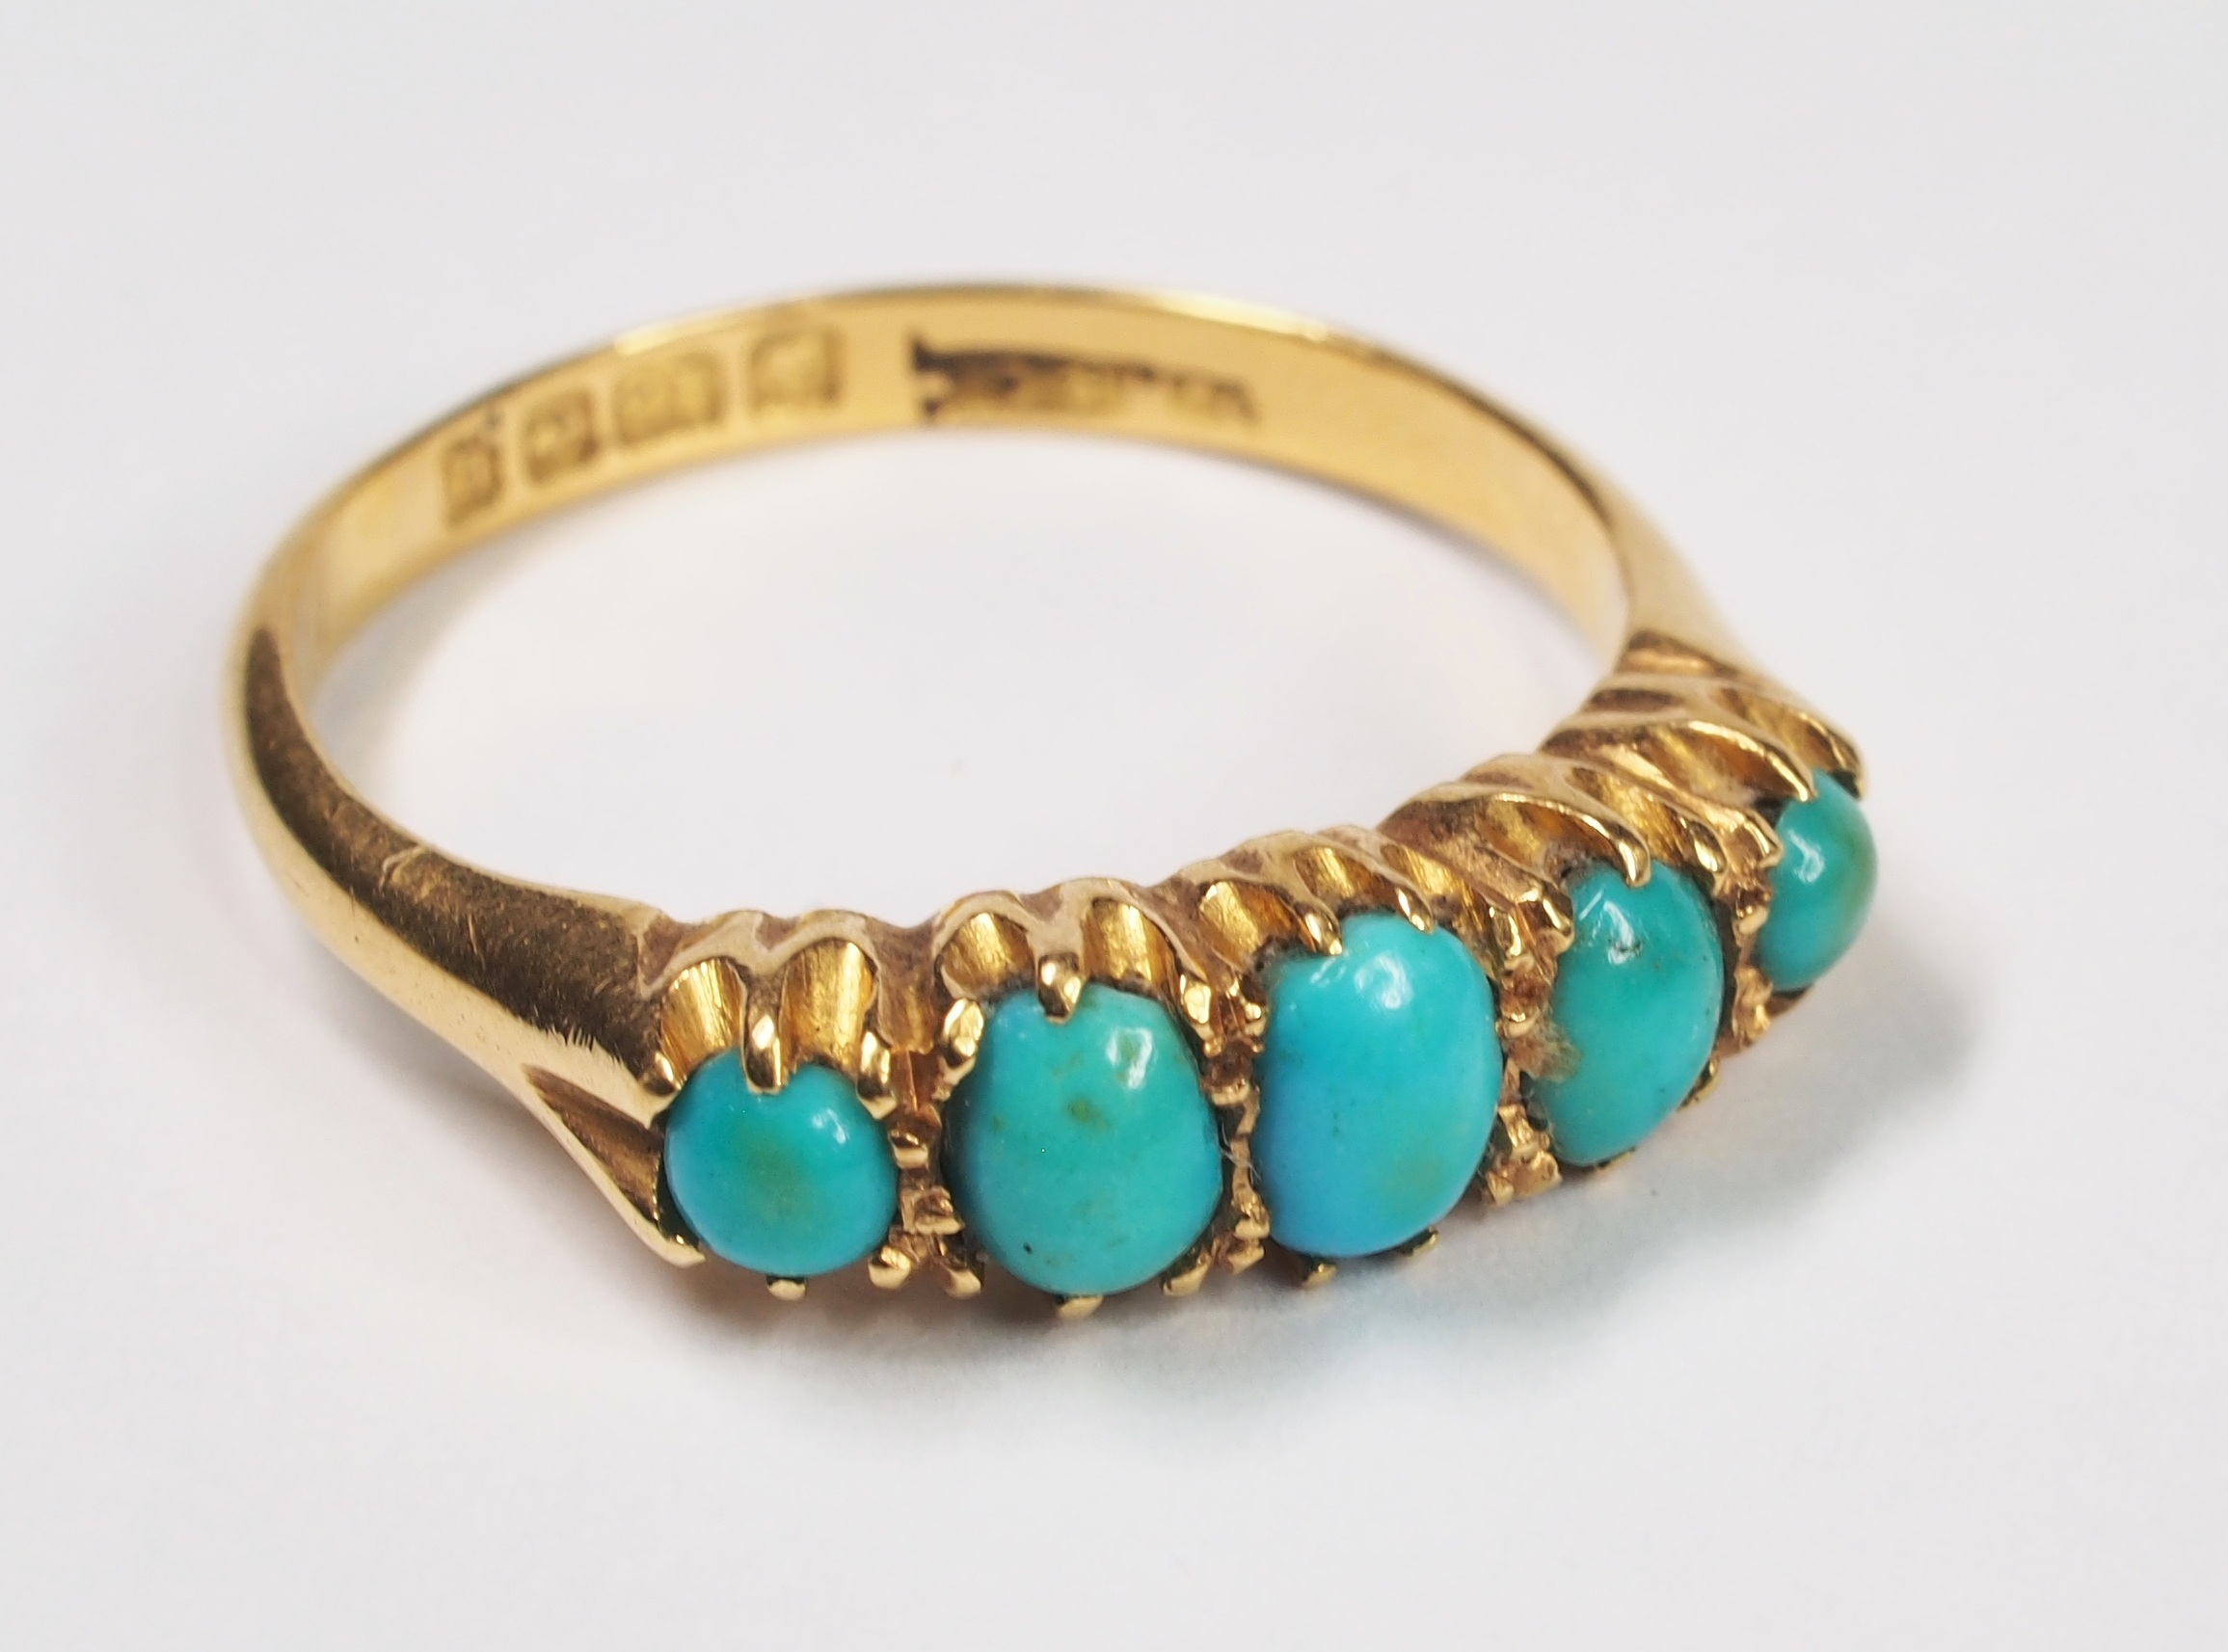 London+bridge+antique+turquoise+ring_1.jpg